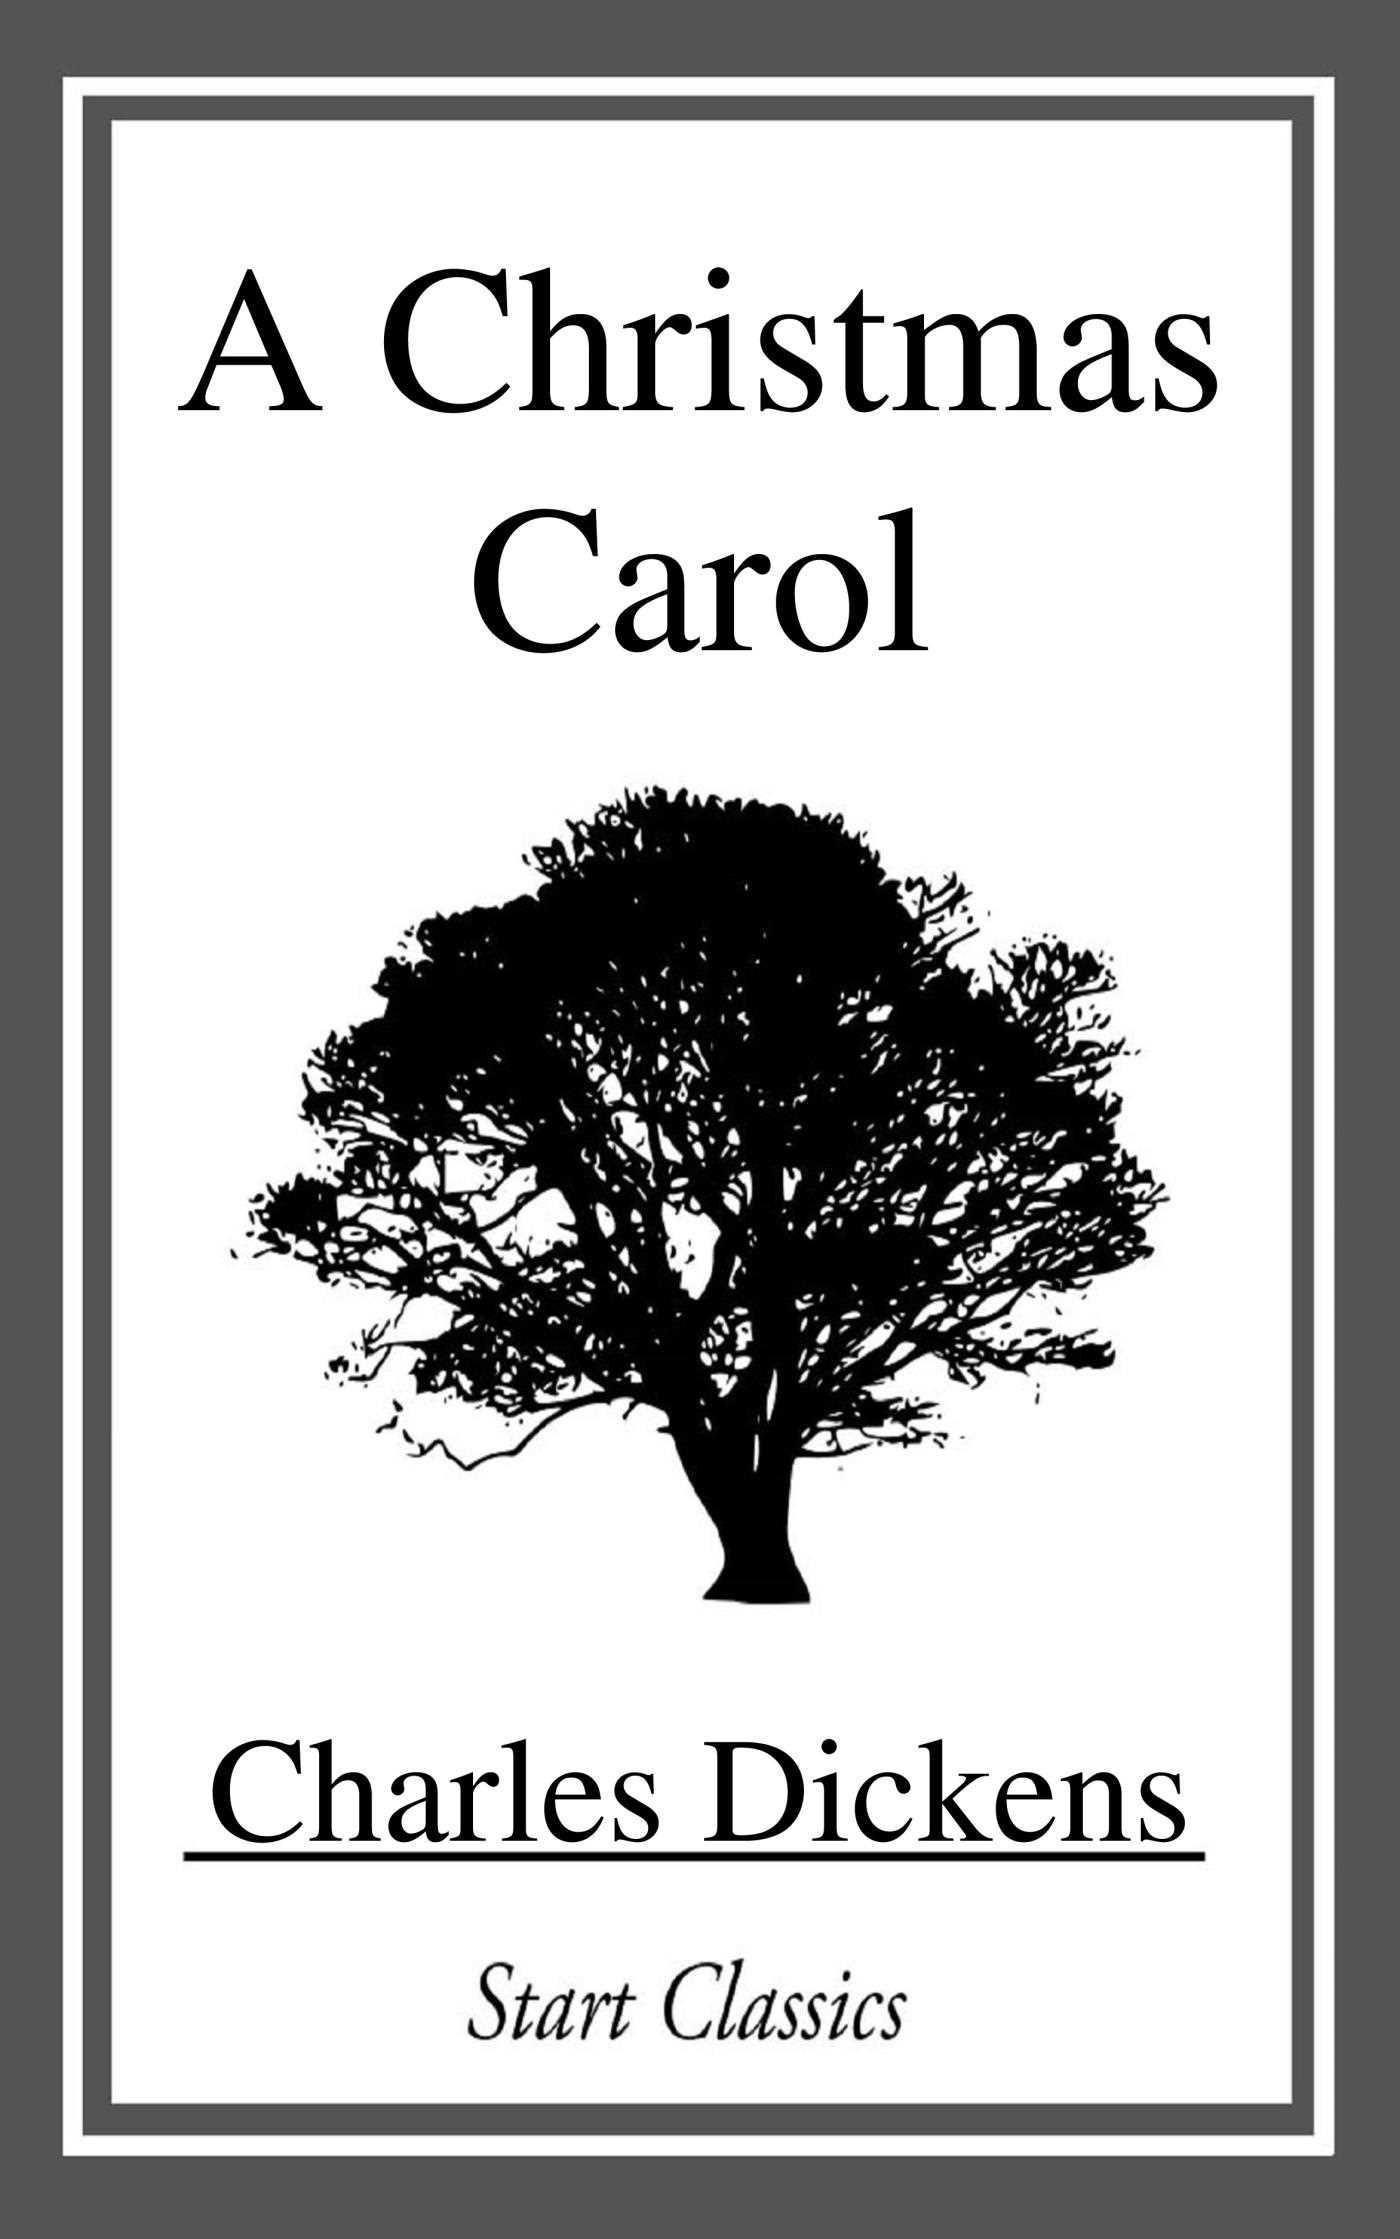 A Christmas Carol Book Cover.A Christmas Carol Ebook By Charles Dickens Official